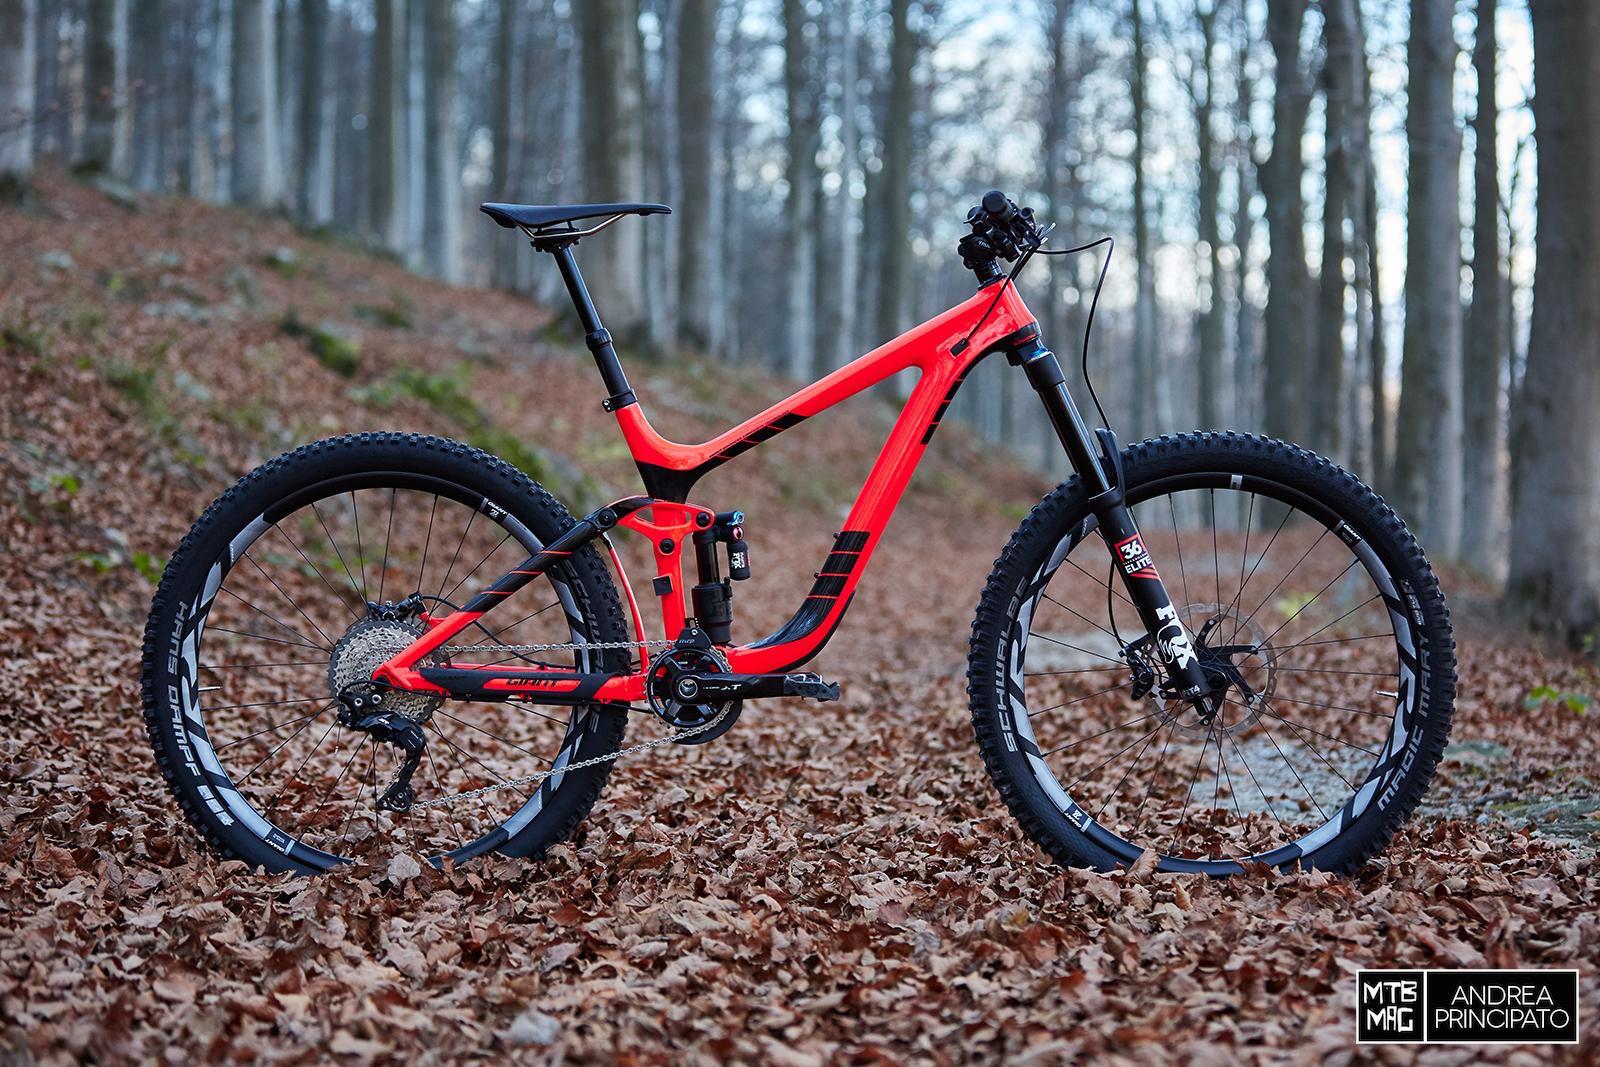 29a8cd91c20 MTB-MAG.COM - Mountain Bike Magazine | [Test] Giant Reign Advanced 1 ...